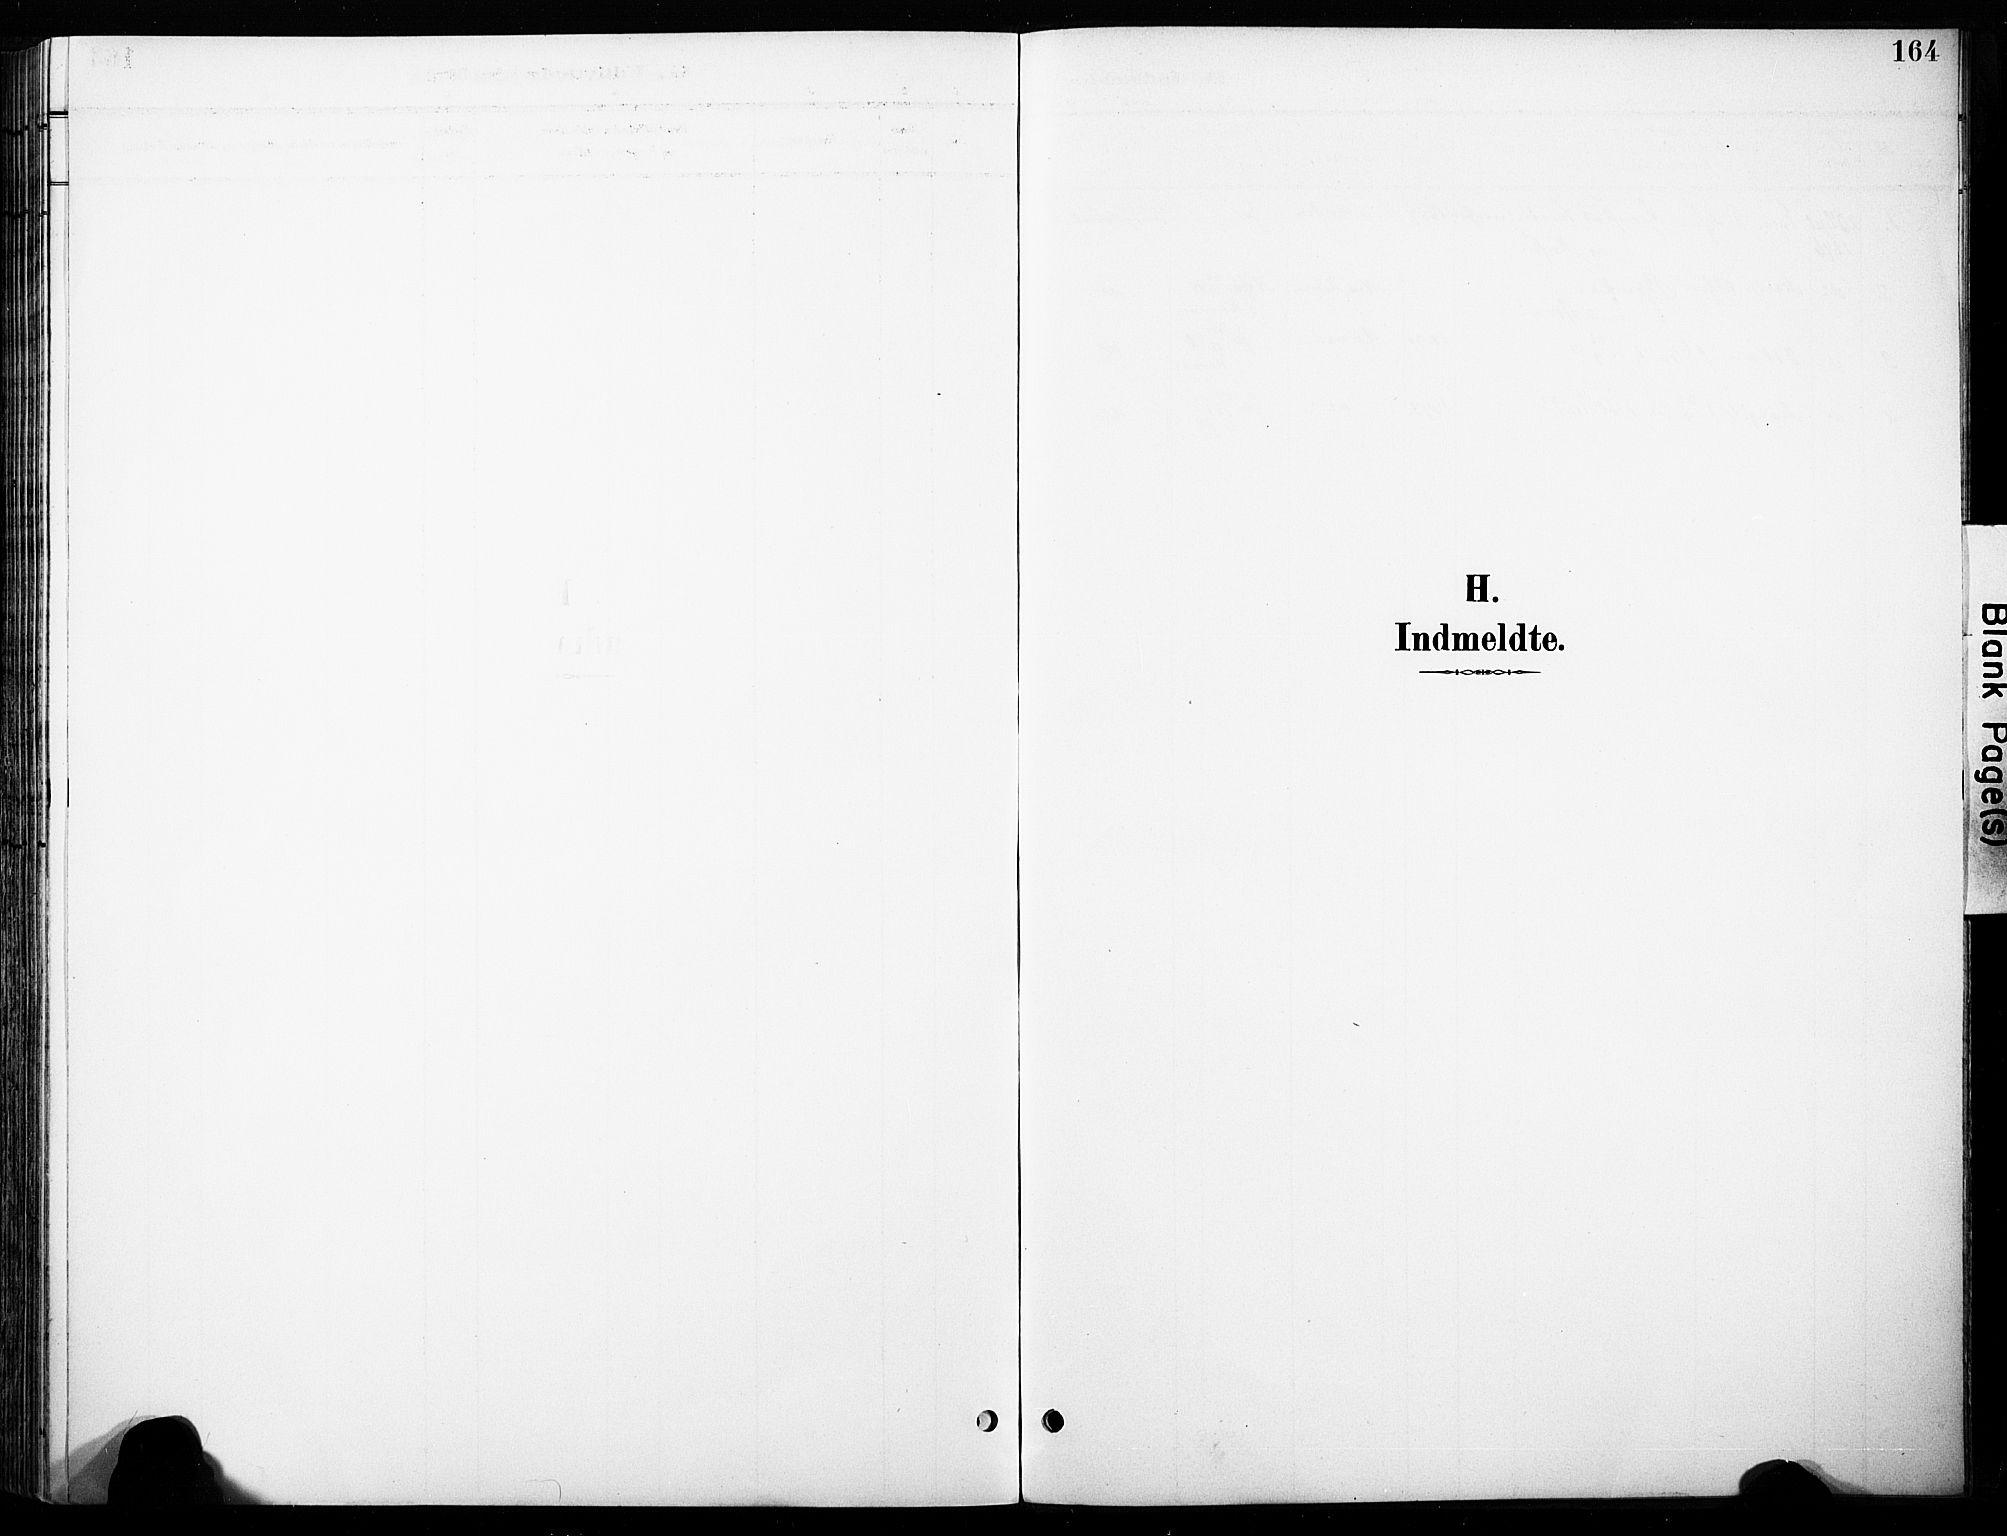 SAH, Øyer prestekontor, Ministerialbok nr. 11, 1894-1905, s. 164